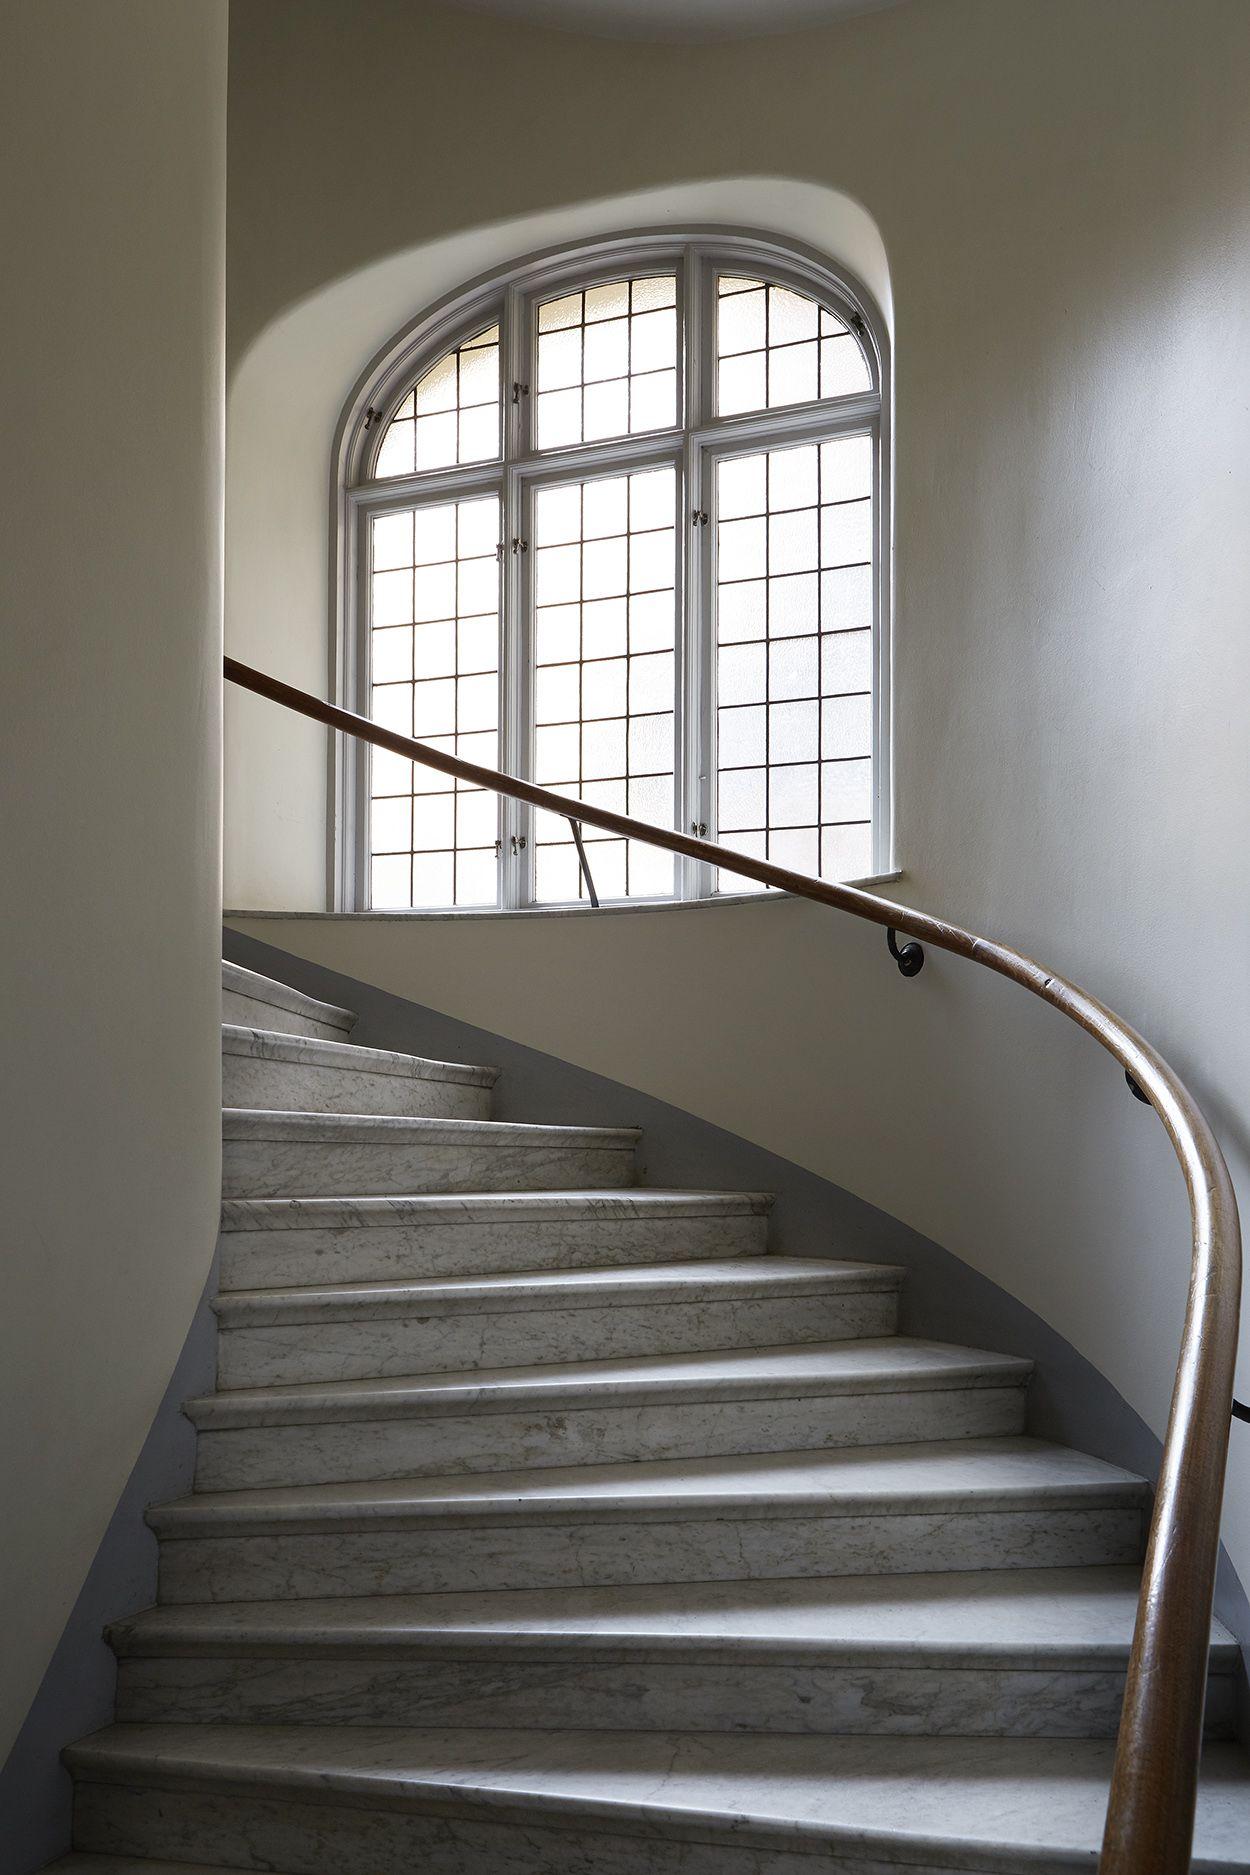 Staircase. Kungsholms hamnplan 7, 6 tr | Fantastic Frank